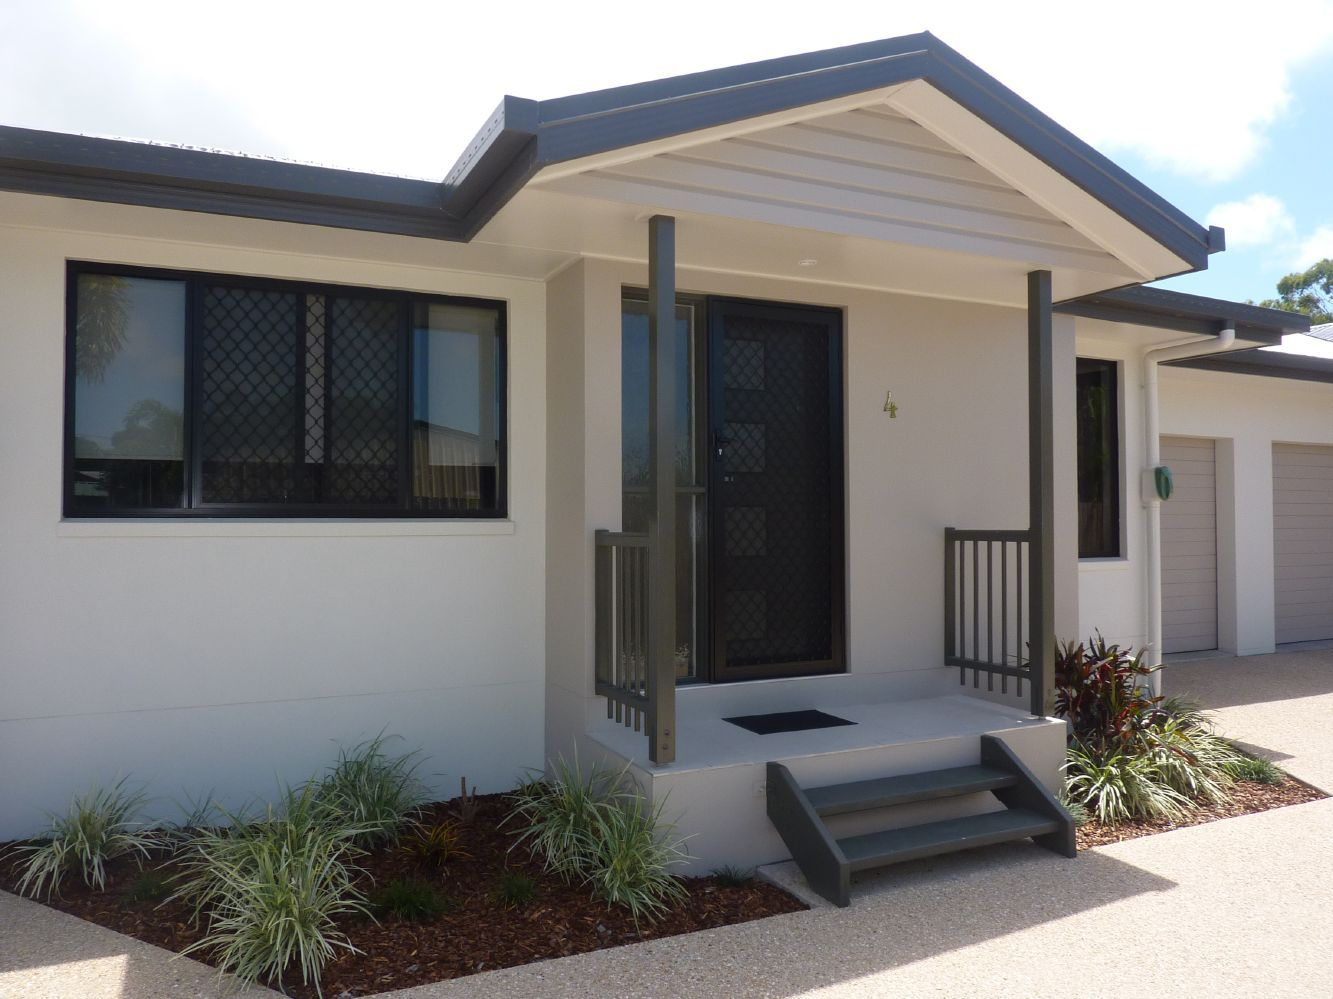 4/22 Canberra Street, North MacKay QLD 4740, Image 0